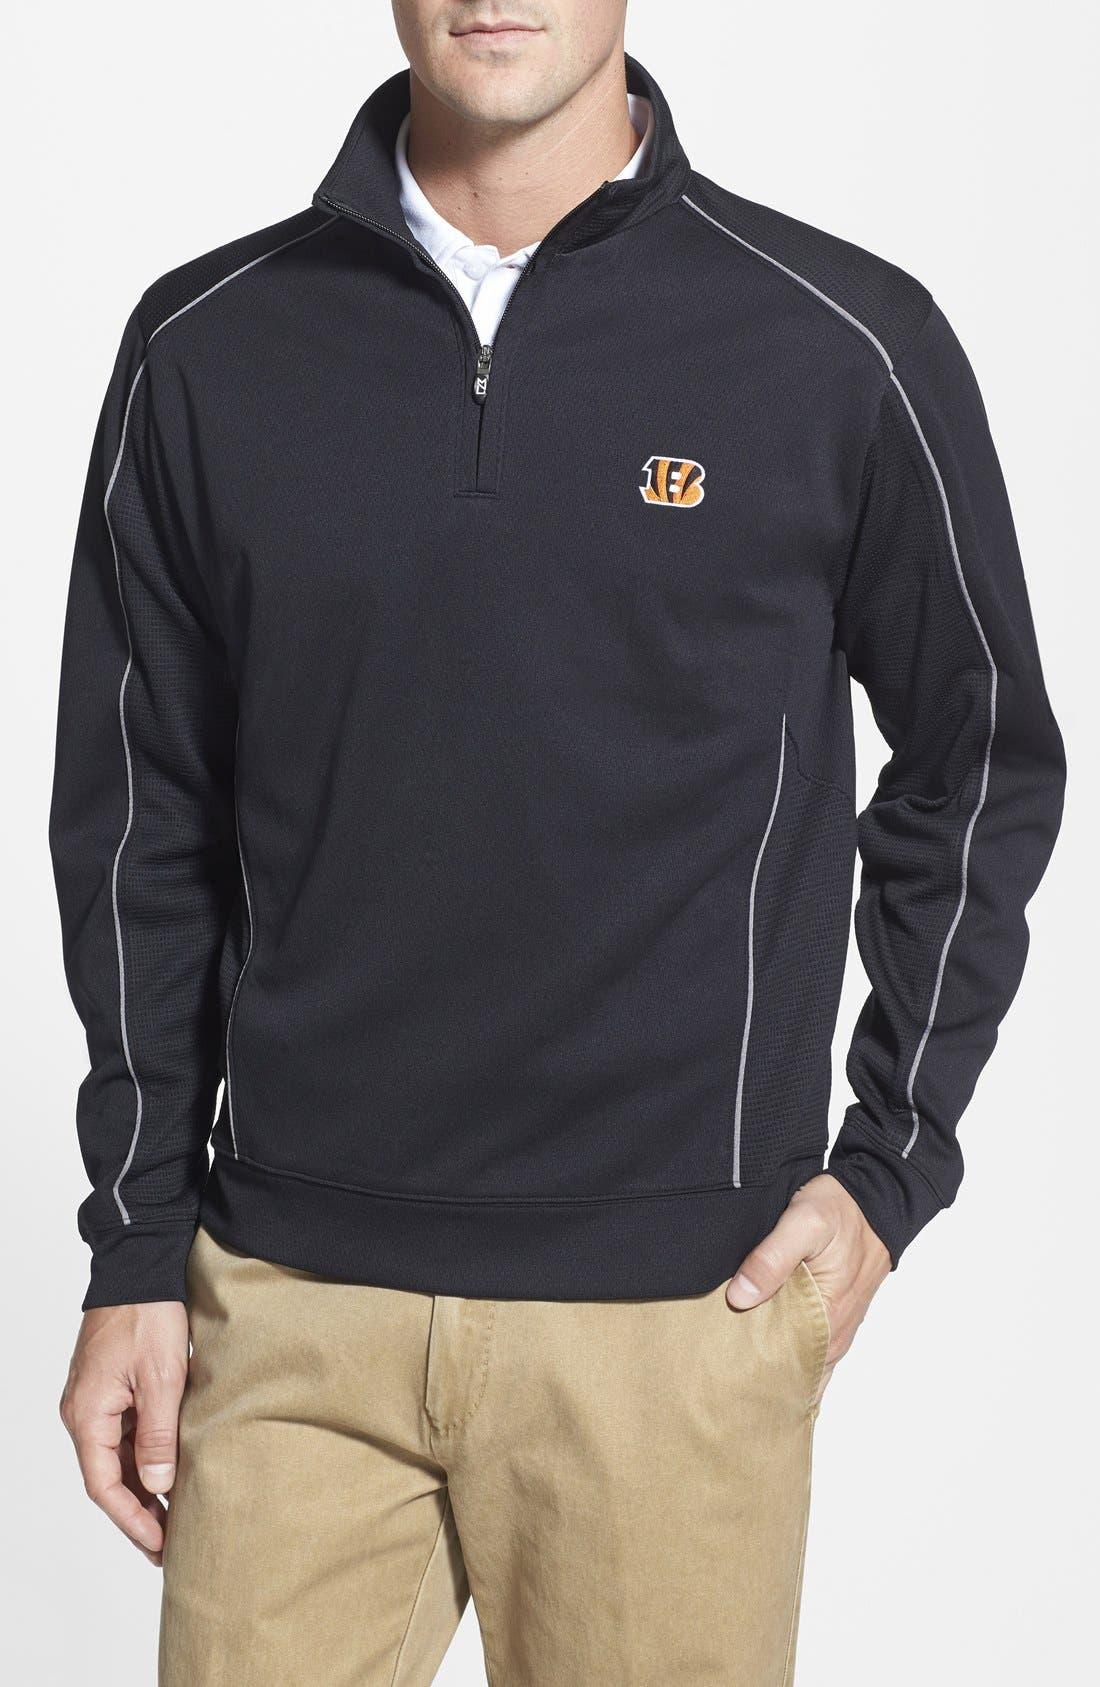 Cincinnati Bengals - Edge DryTec Moisture Wicking Half Zip Pullover,                             Main thumbnail 1, color,                             001